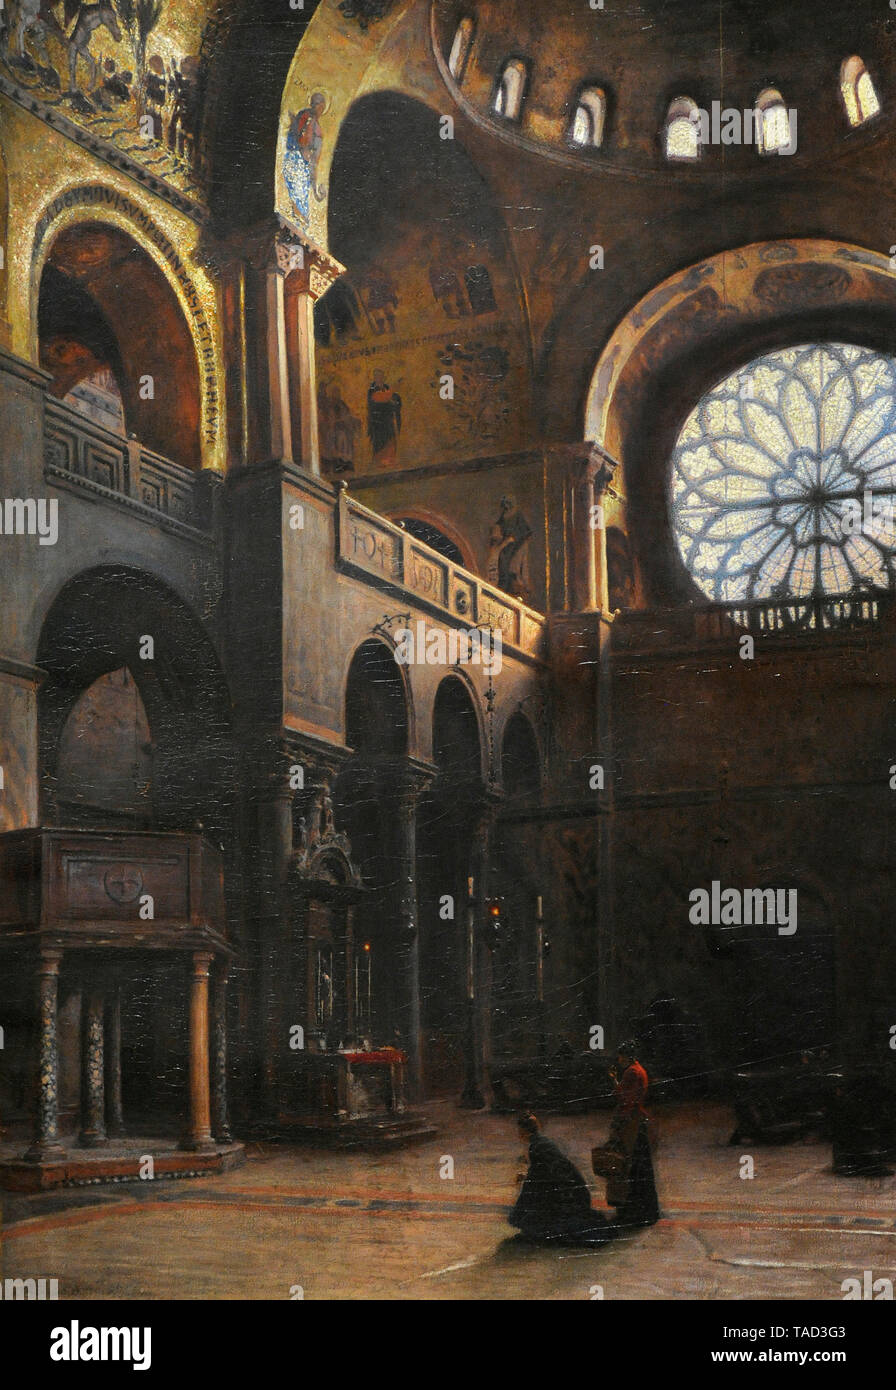 Aleksander Gierymski (1850-1901). Polish painter. Interior of St Mark Basilica in Venice, 1899. National Museum. Warsaw. Poland. - Stock Image